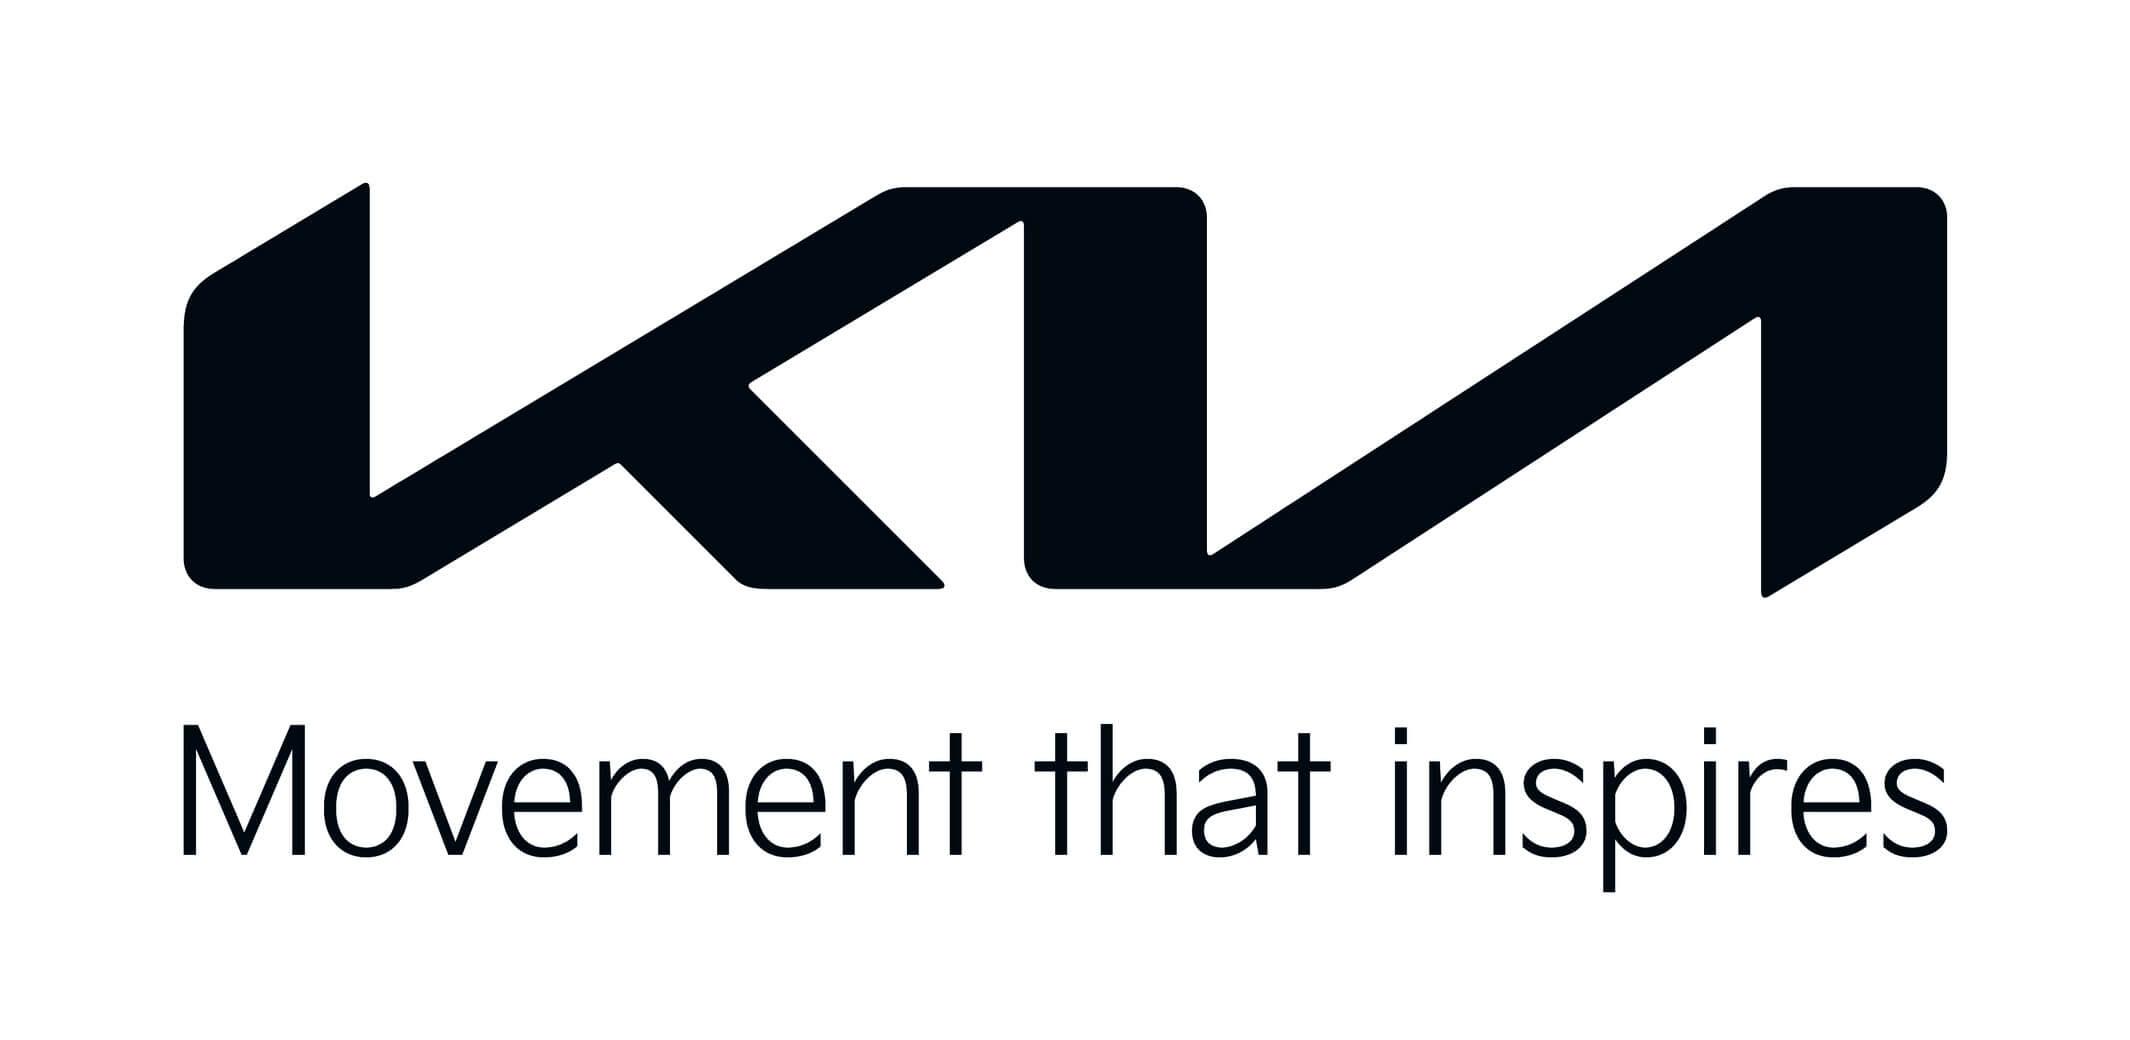 Kia logotipo